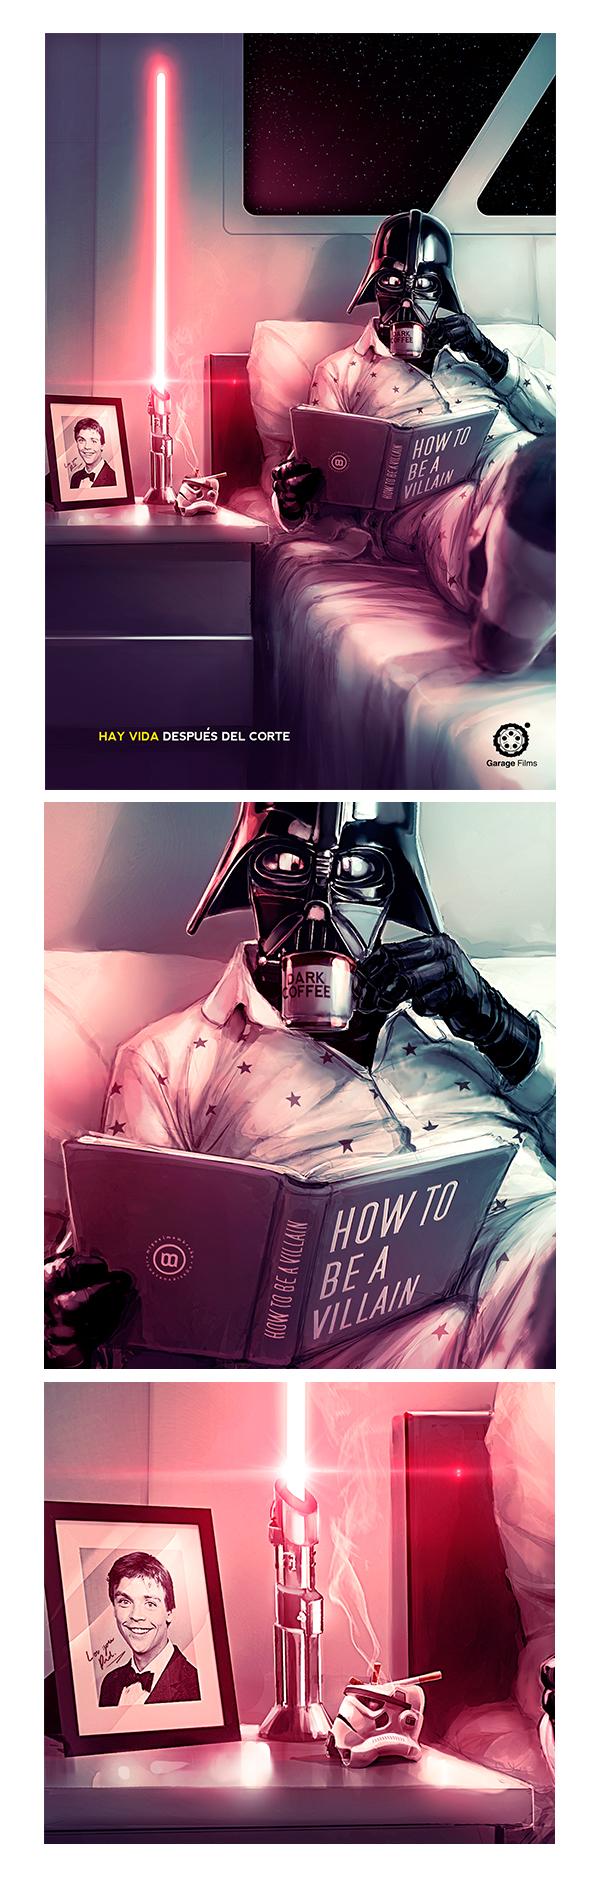 Garage Films Illustration by Miguel Membreno